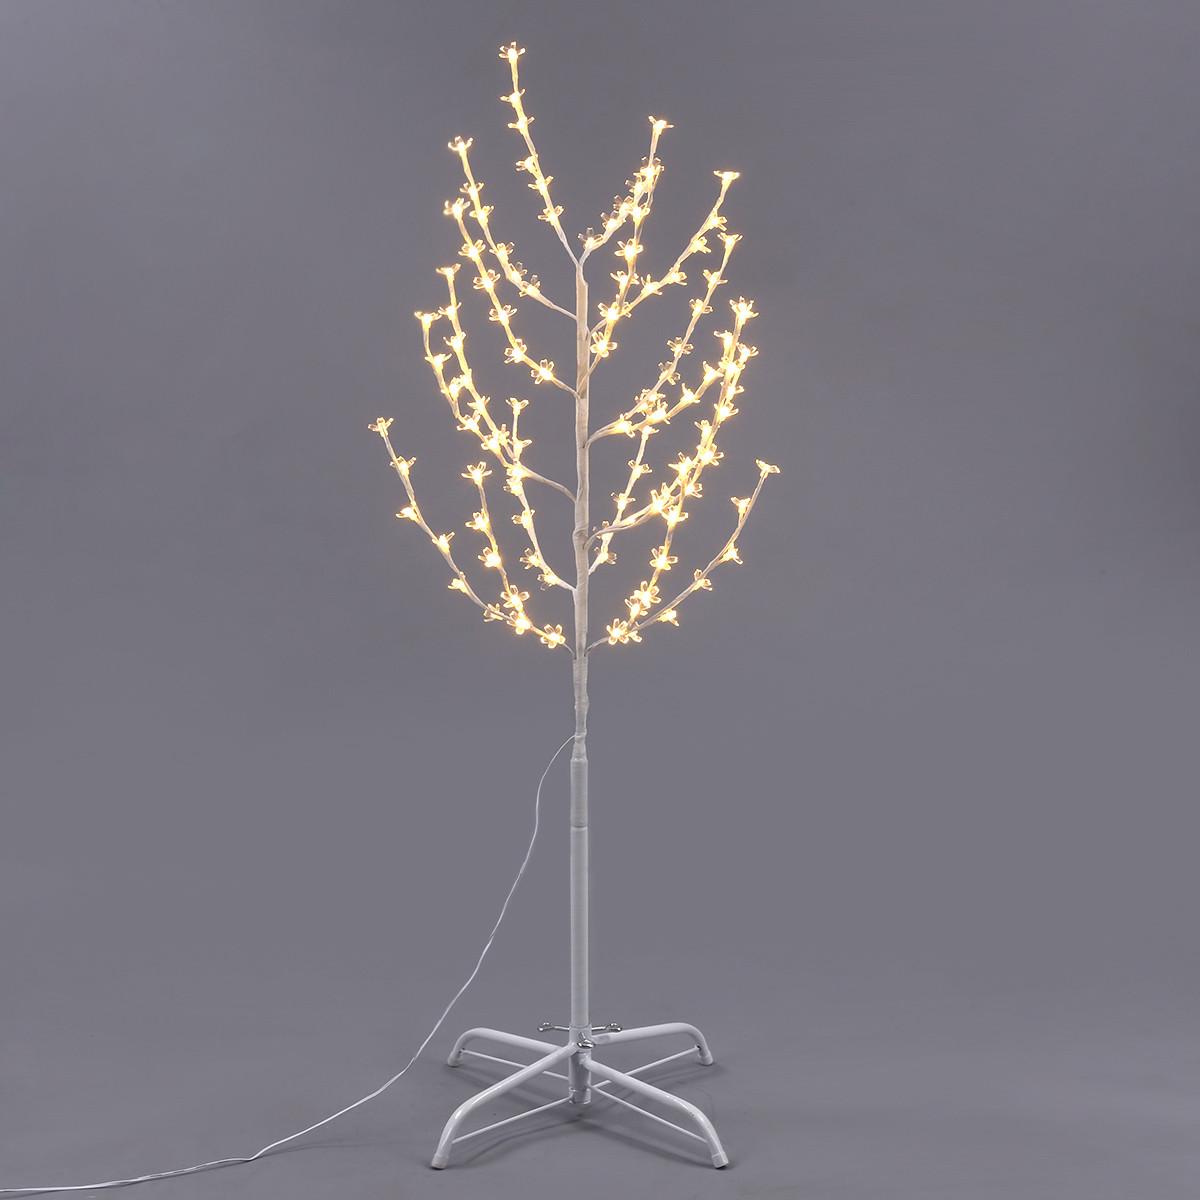 White Indoor Christmas Lights  Waterproof LED Christmas Light Tree Lights Warm White Home